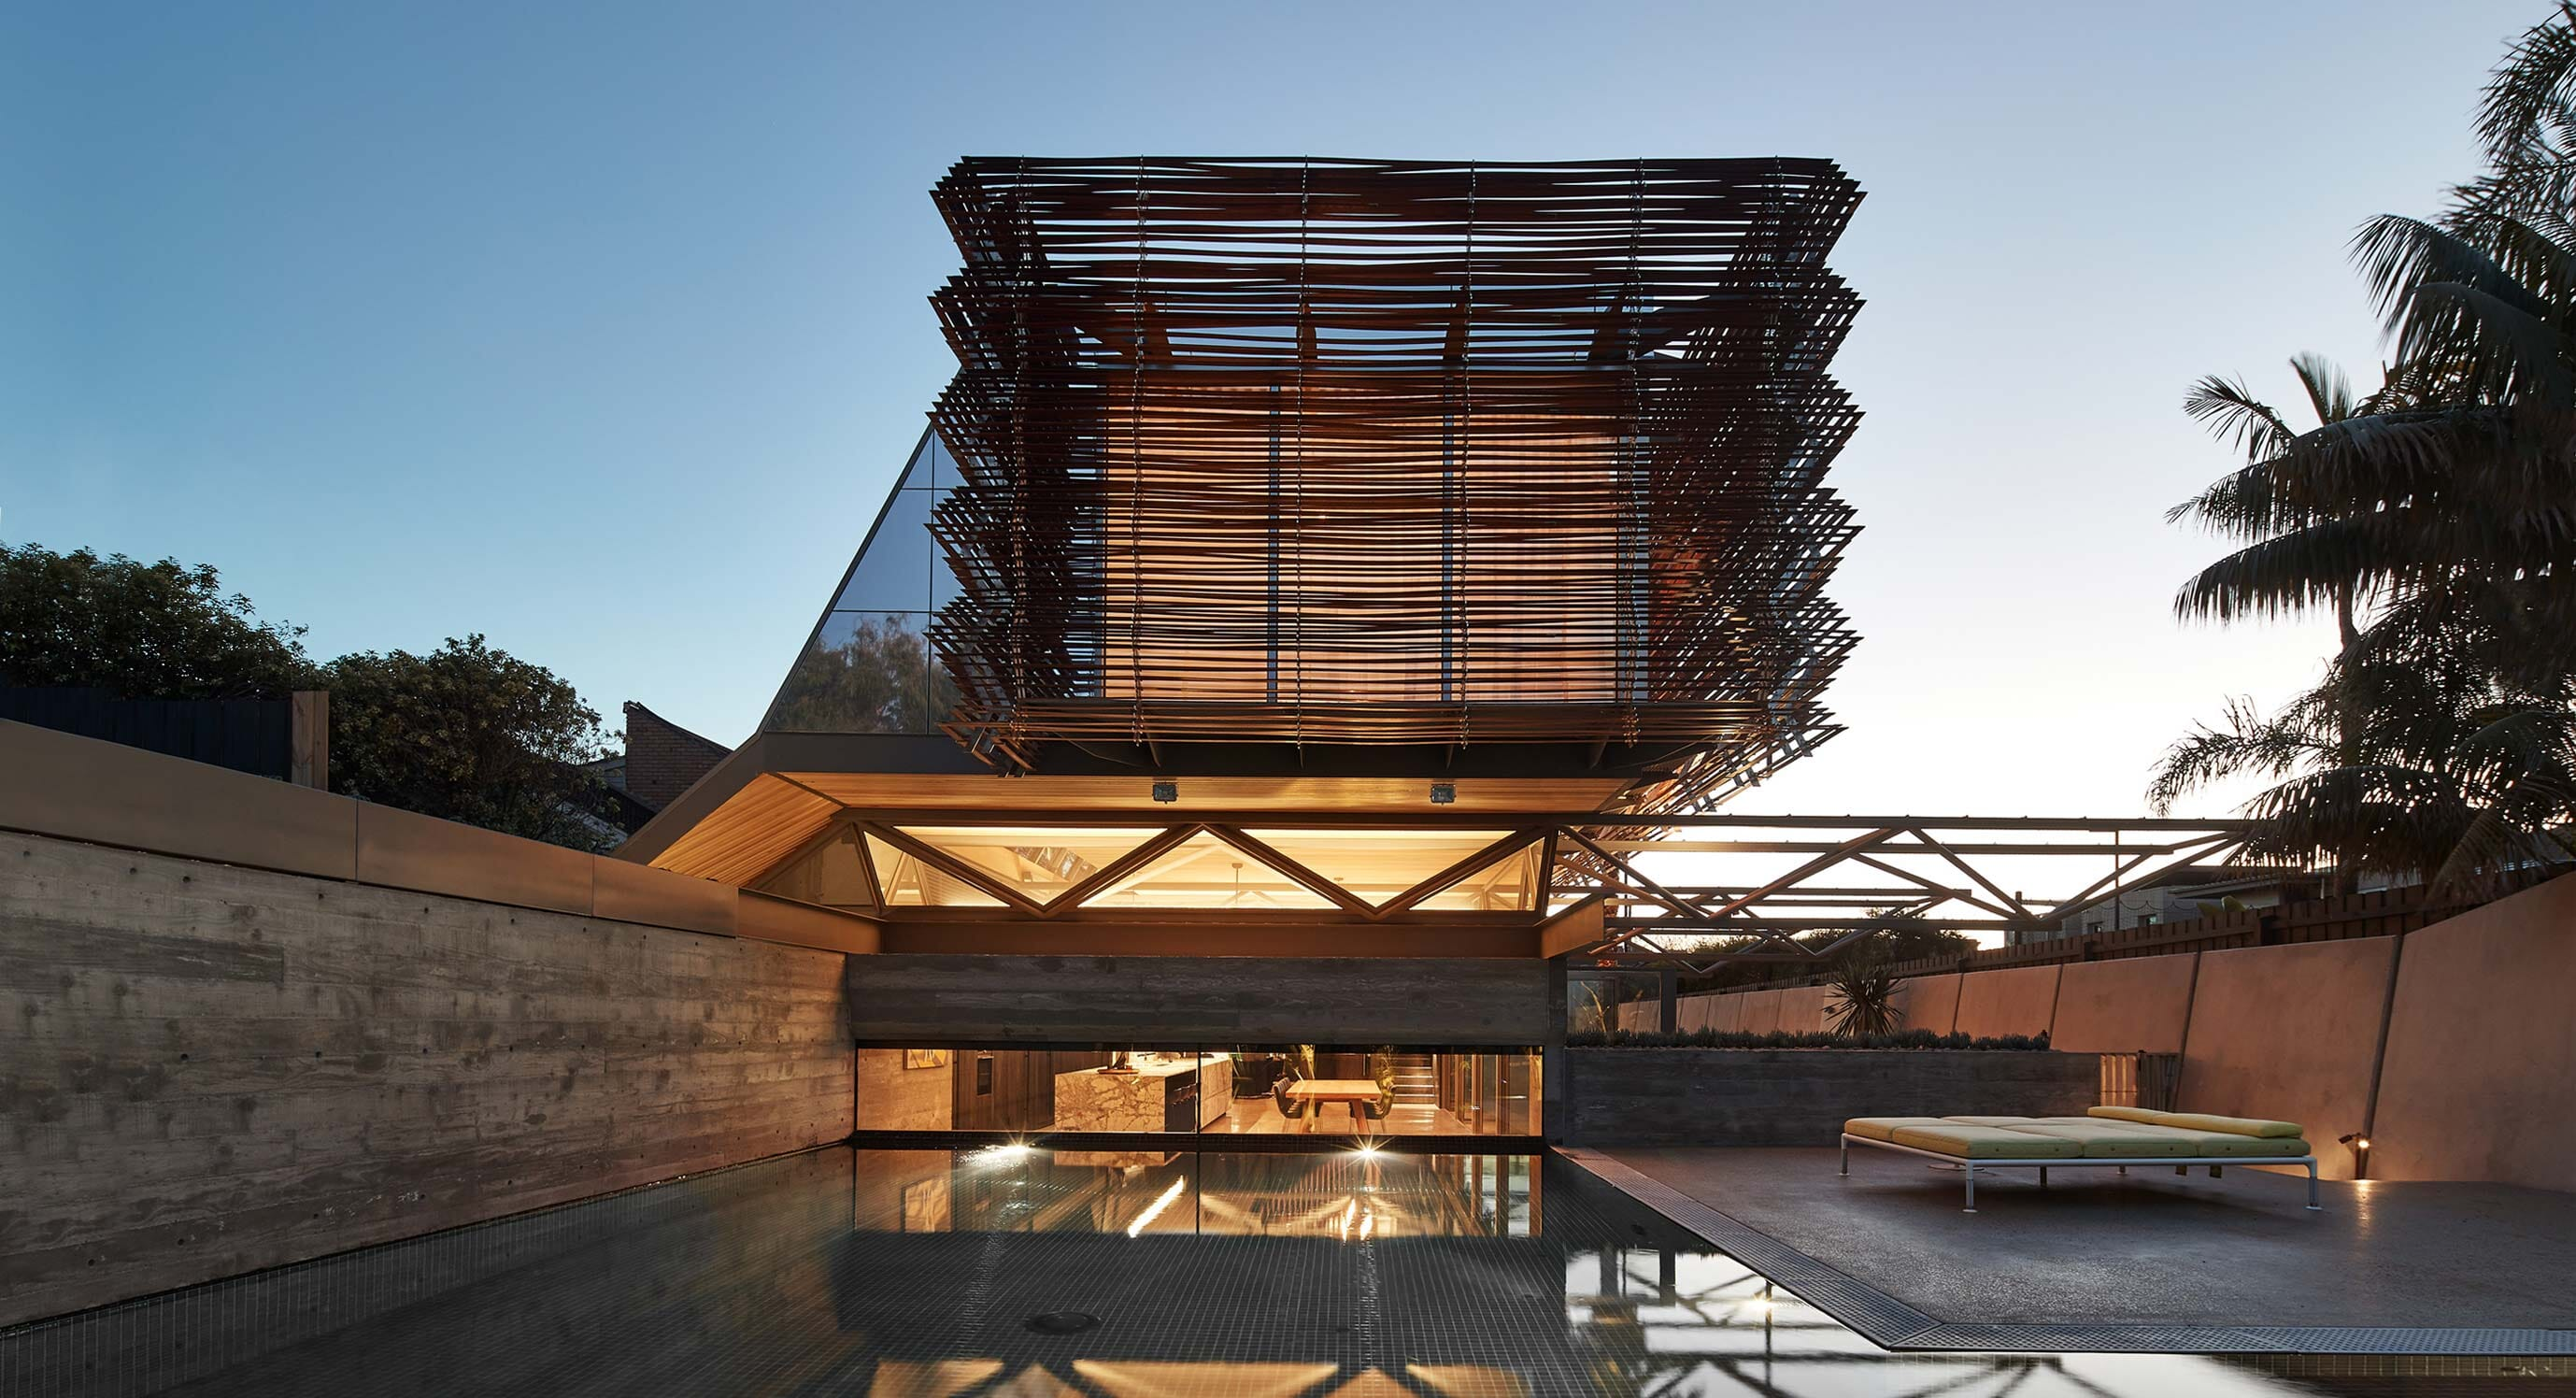 March Studio's Compound House Celebrates Steel